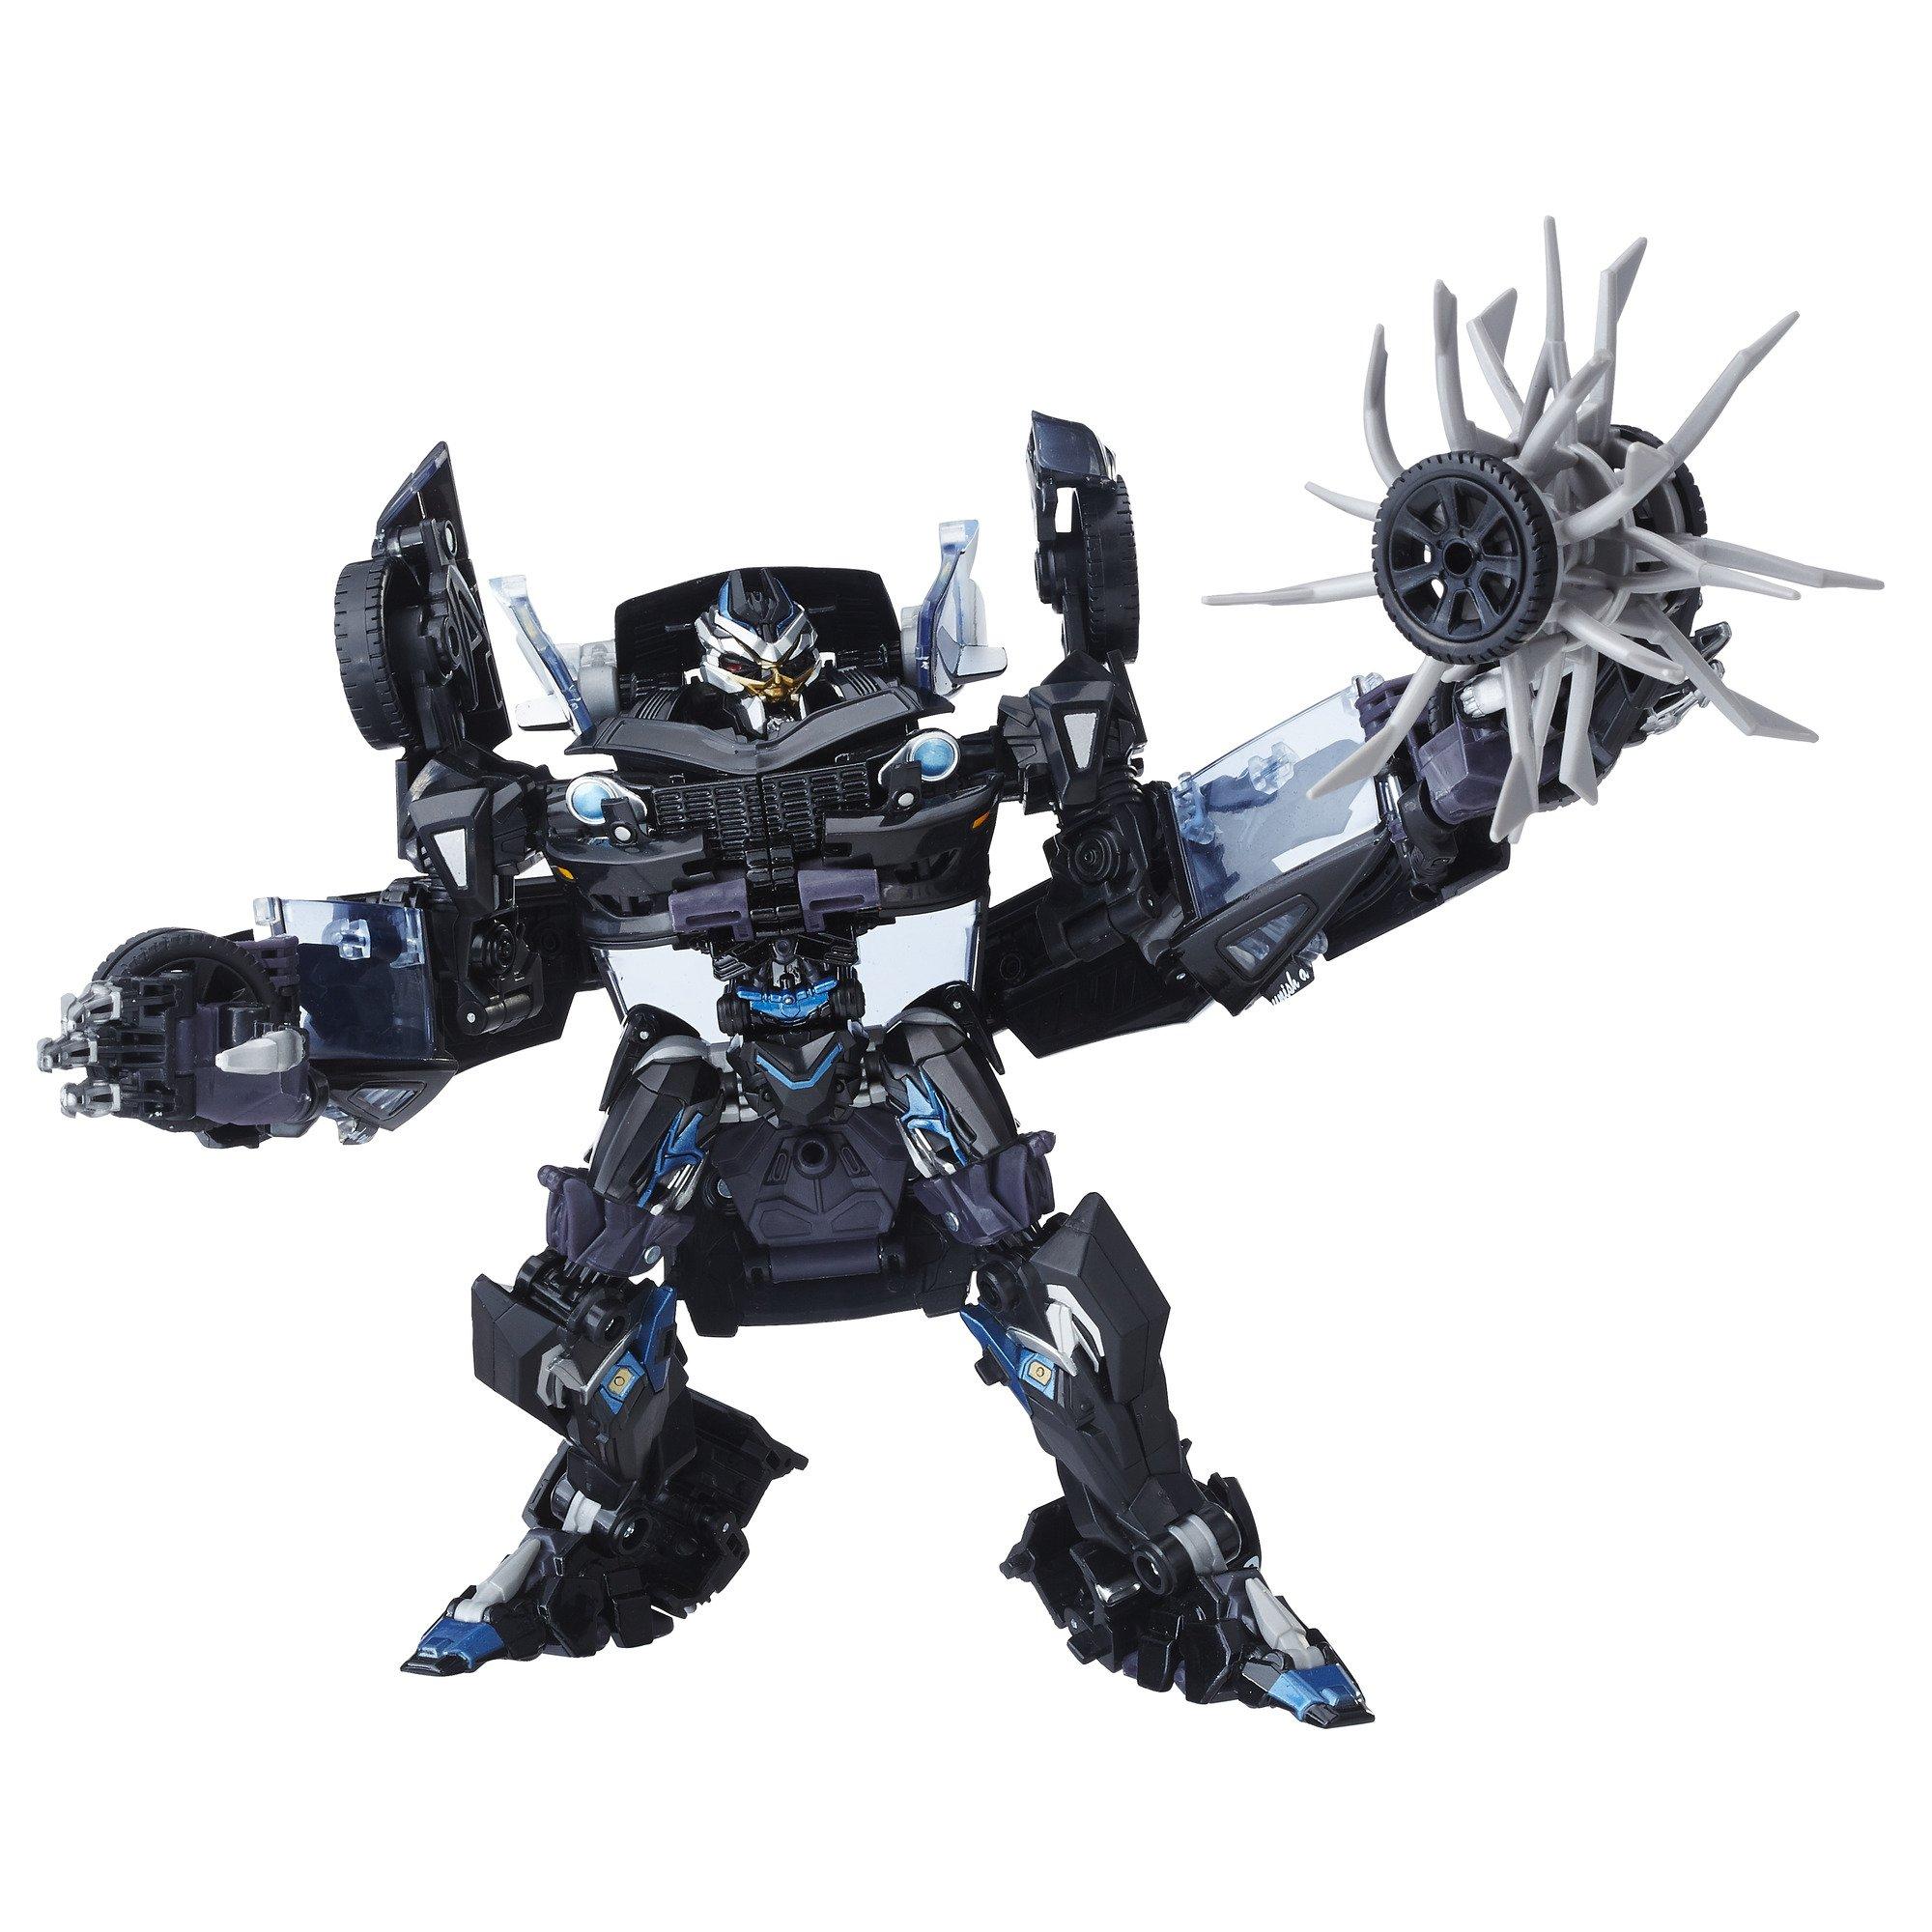 Barricade Transformers 5 The Last Knight Autobots Sci-fi Robots Action Figure